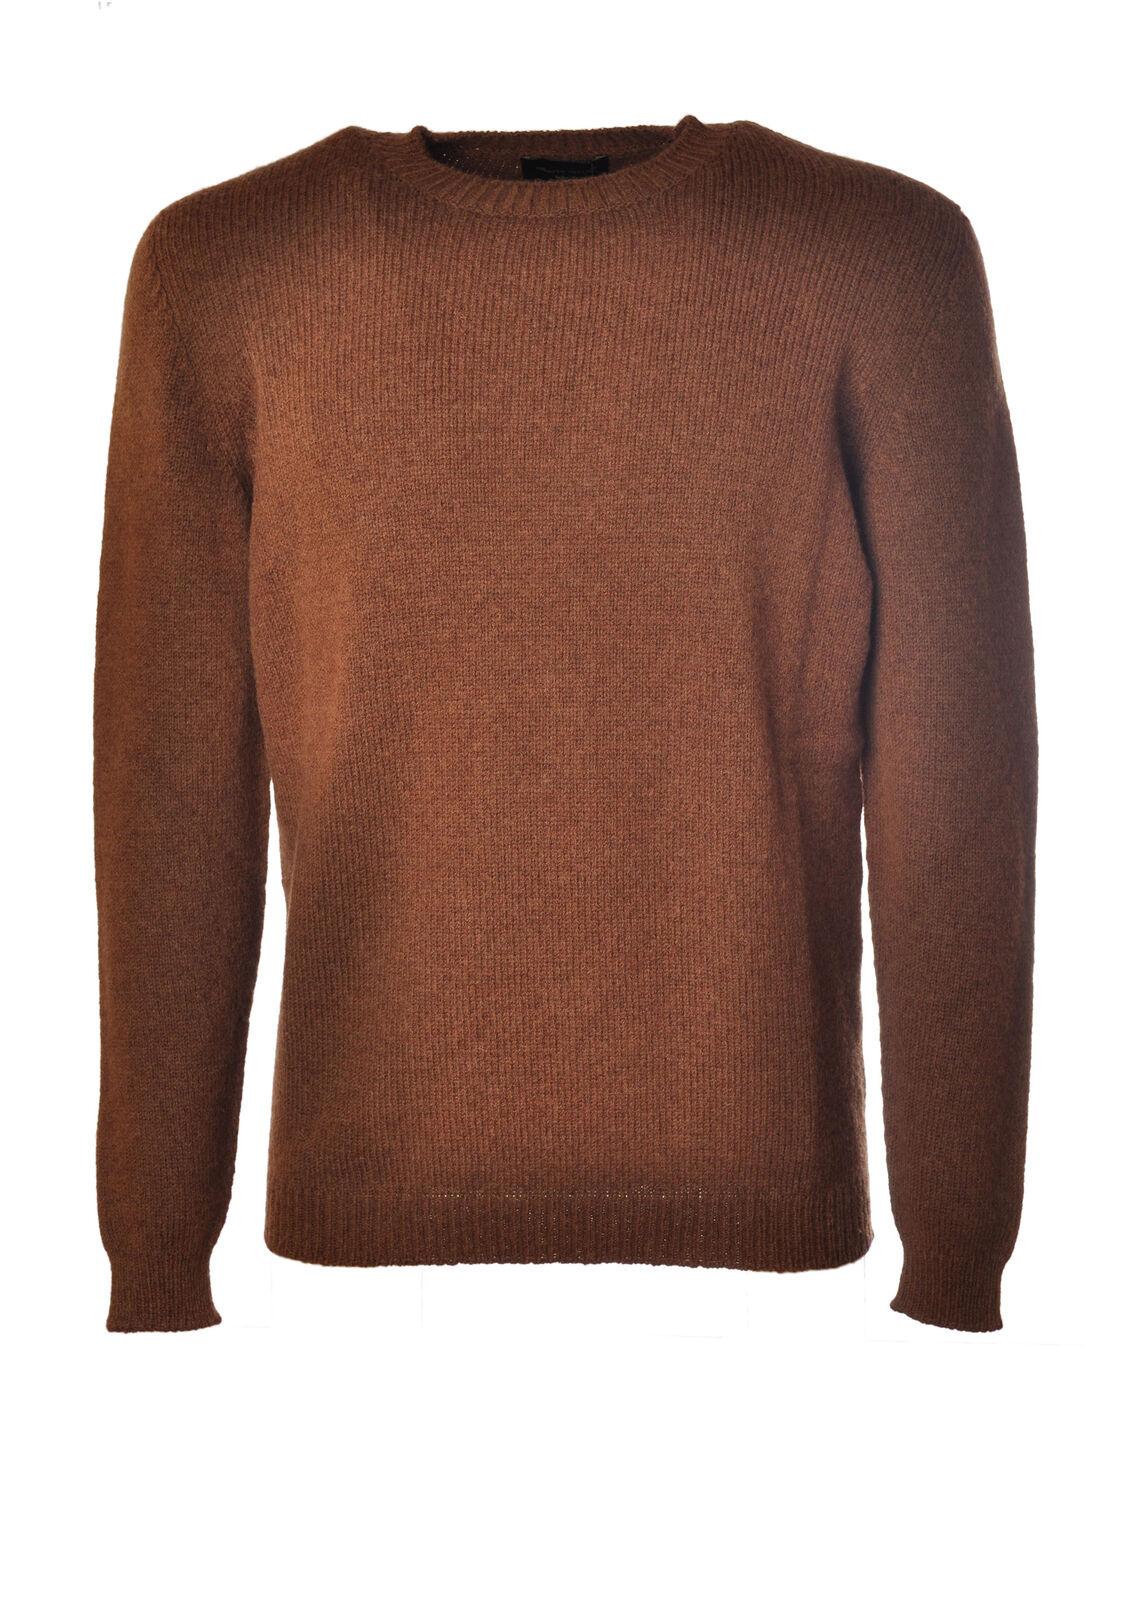 Roberto Collina  -  Sweaters - Male - Leder - 3987531A185111